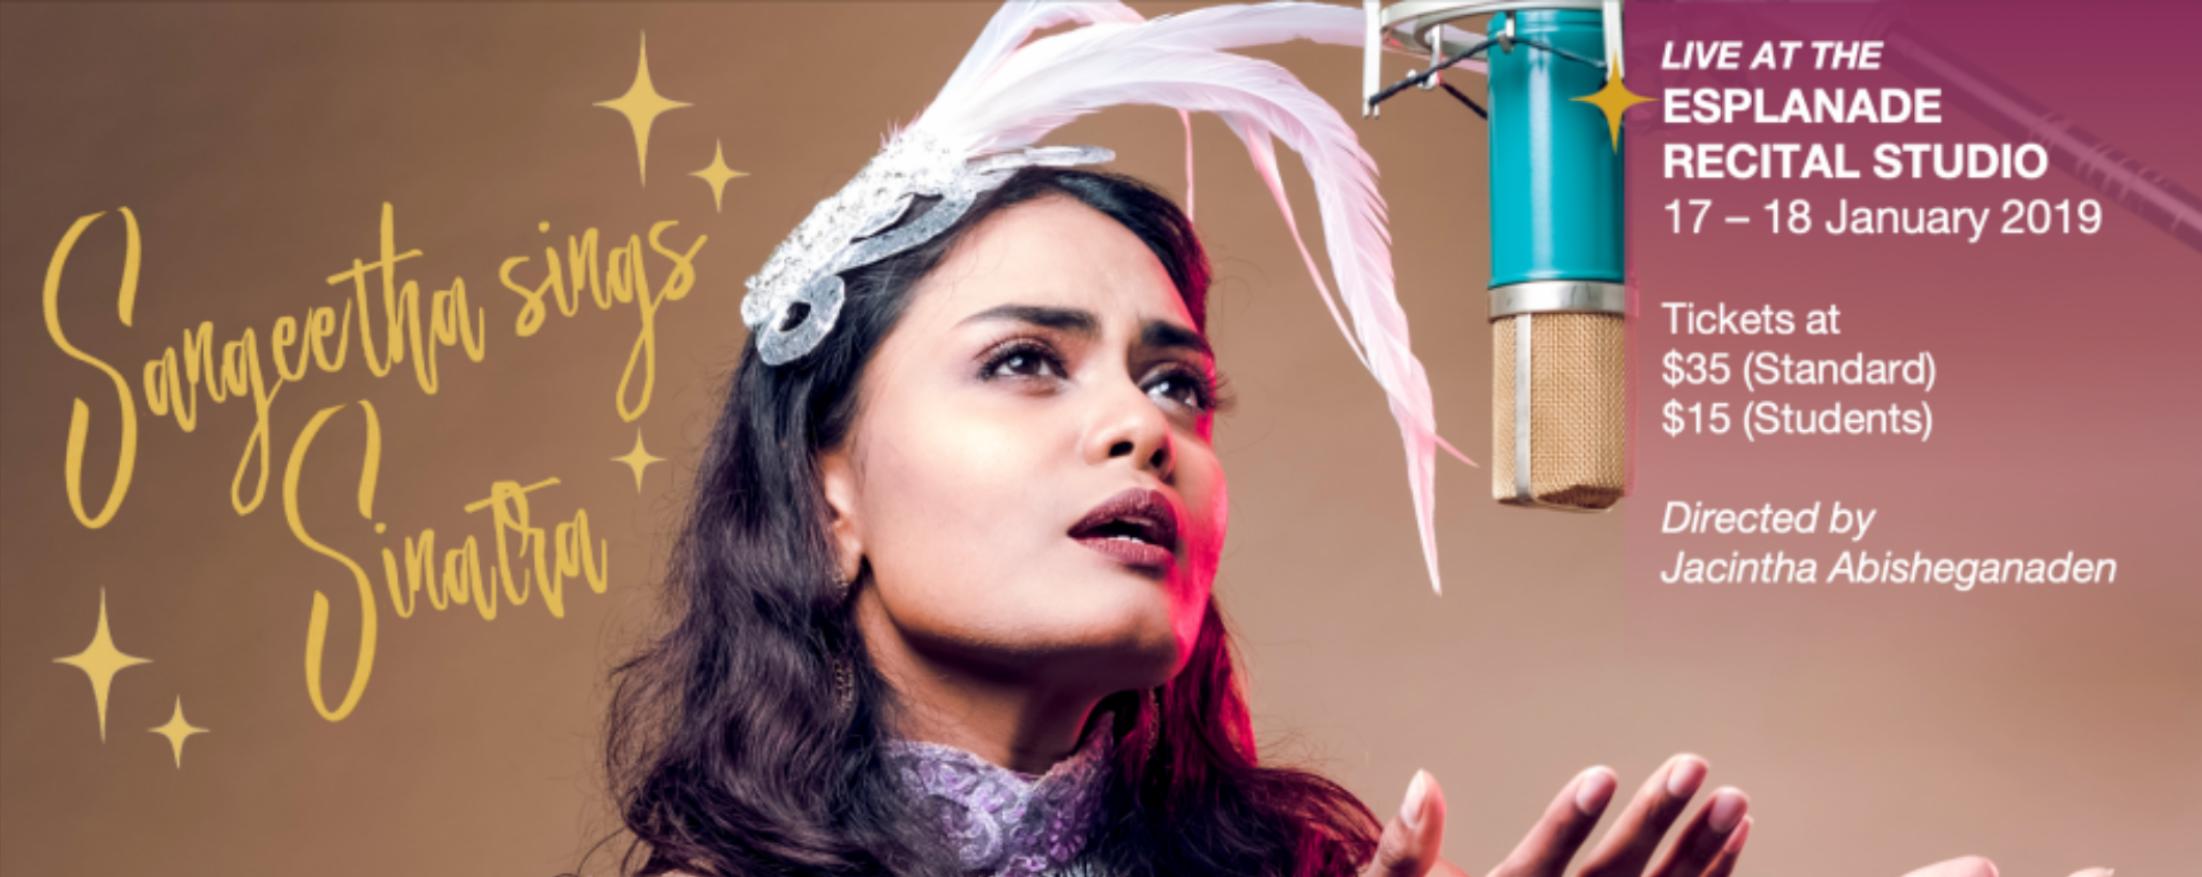 Sangeetha Sings Sinatra